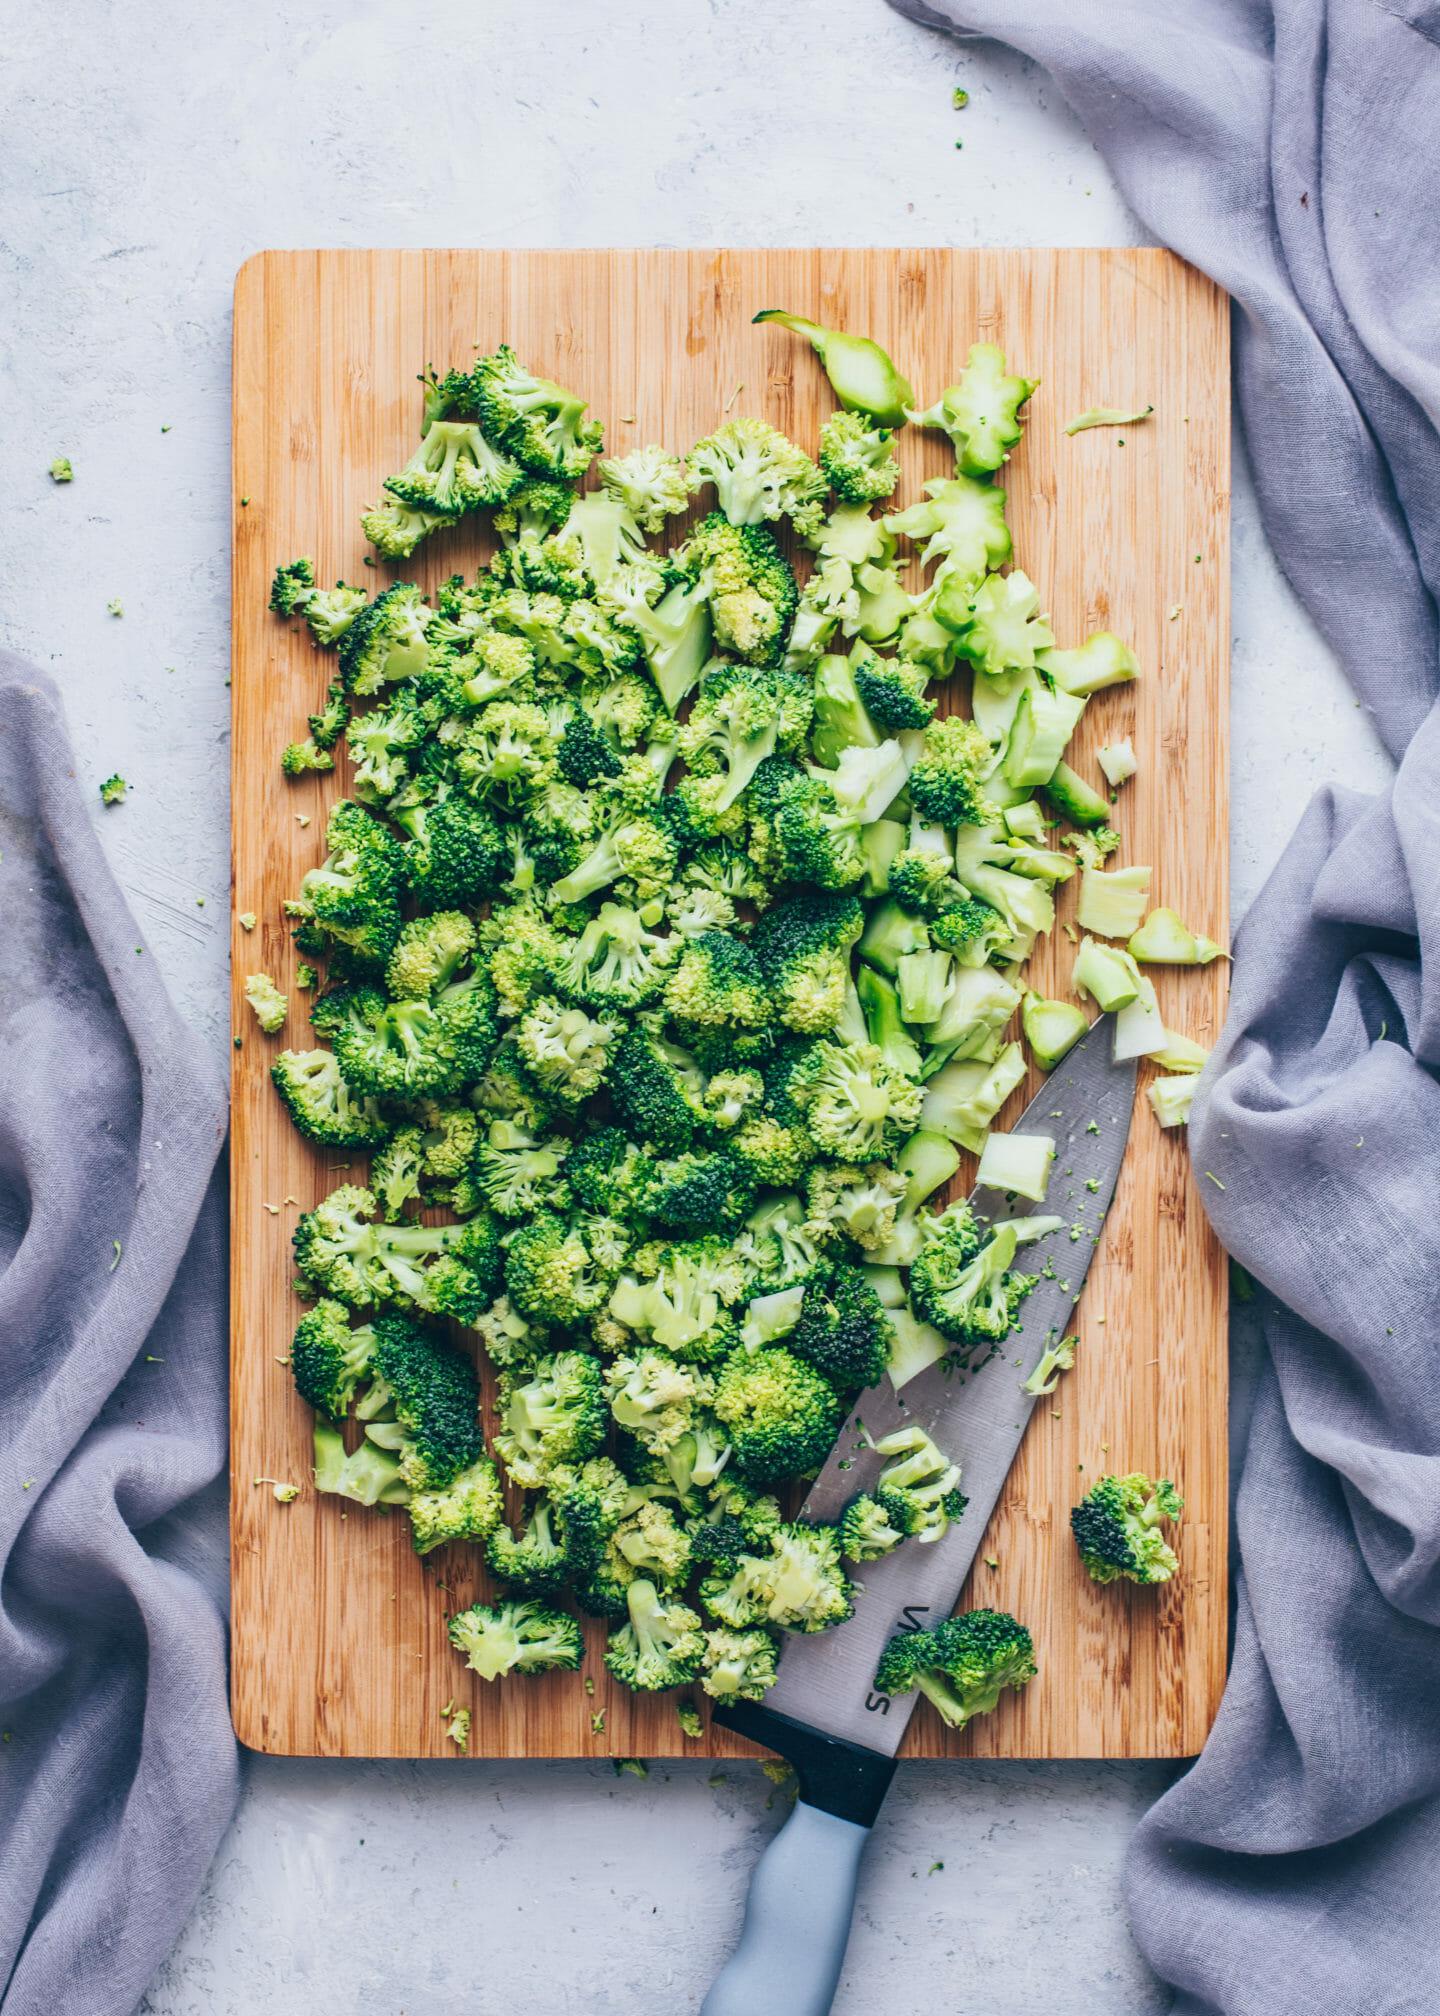 Chopped raw broccoli florets